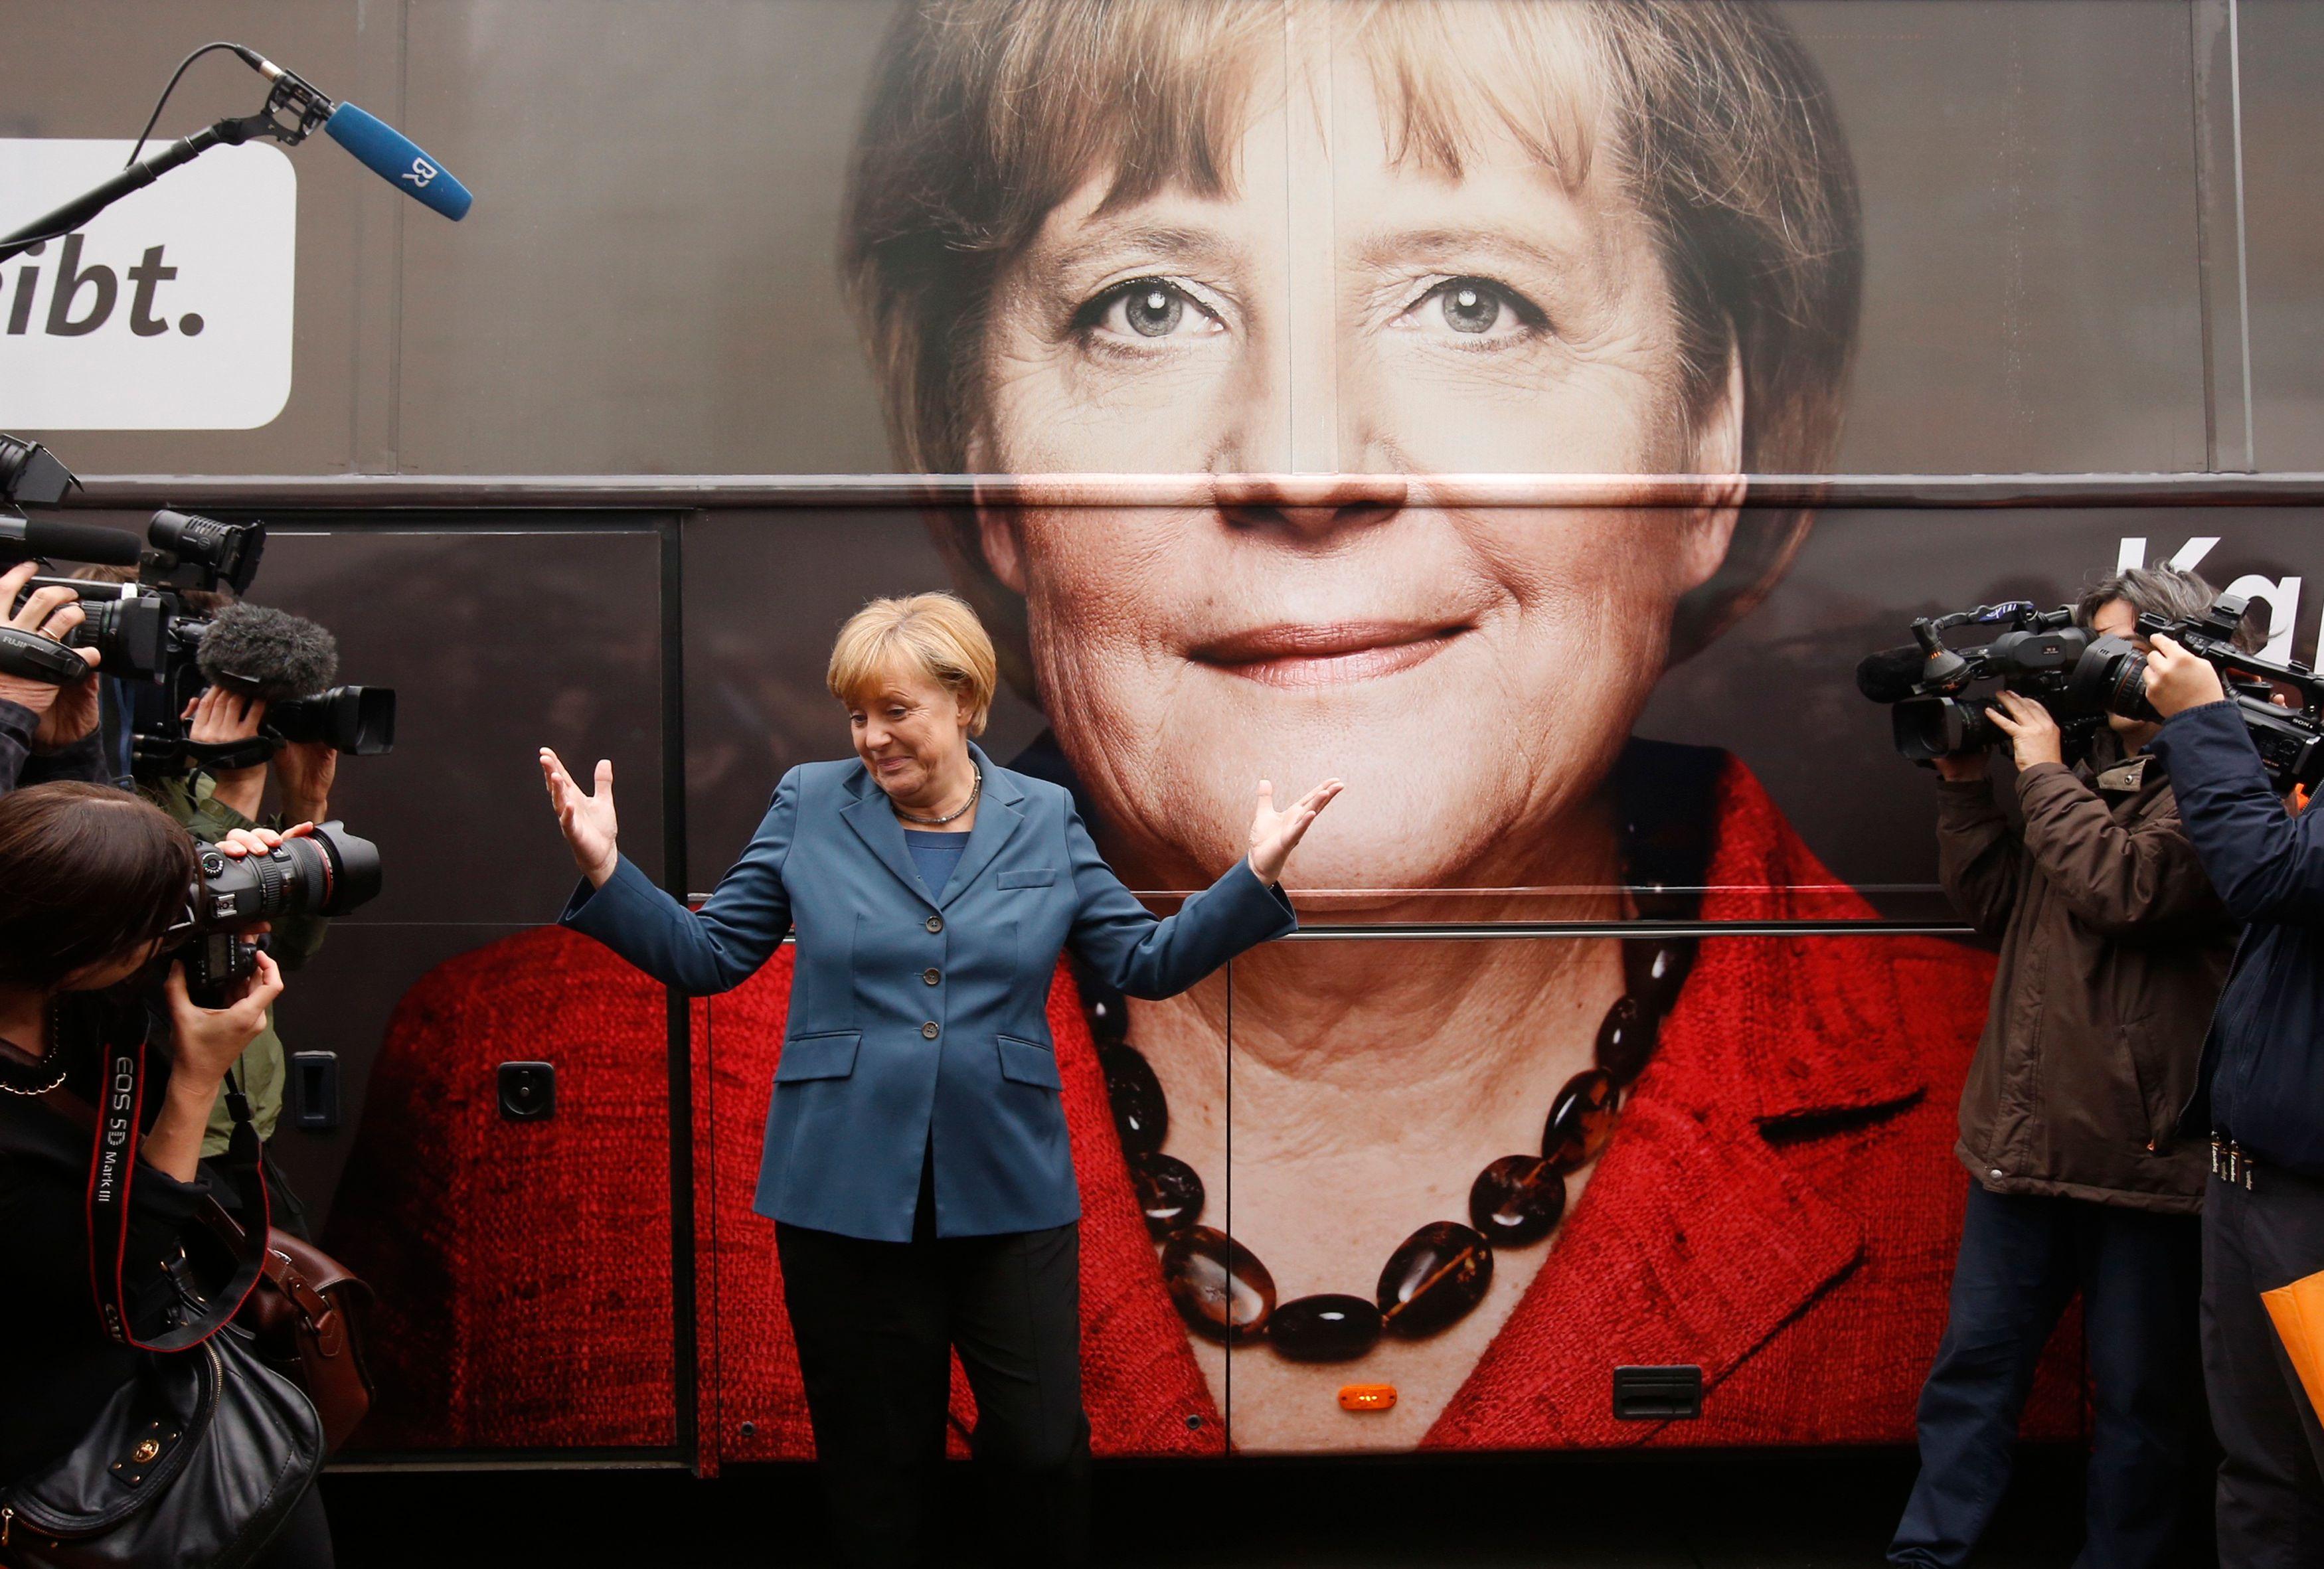 Angela Merkel vise un 4ème mandat